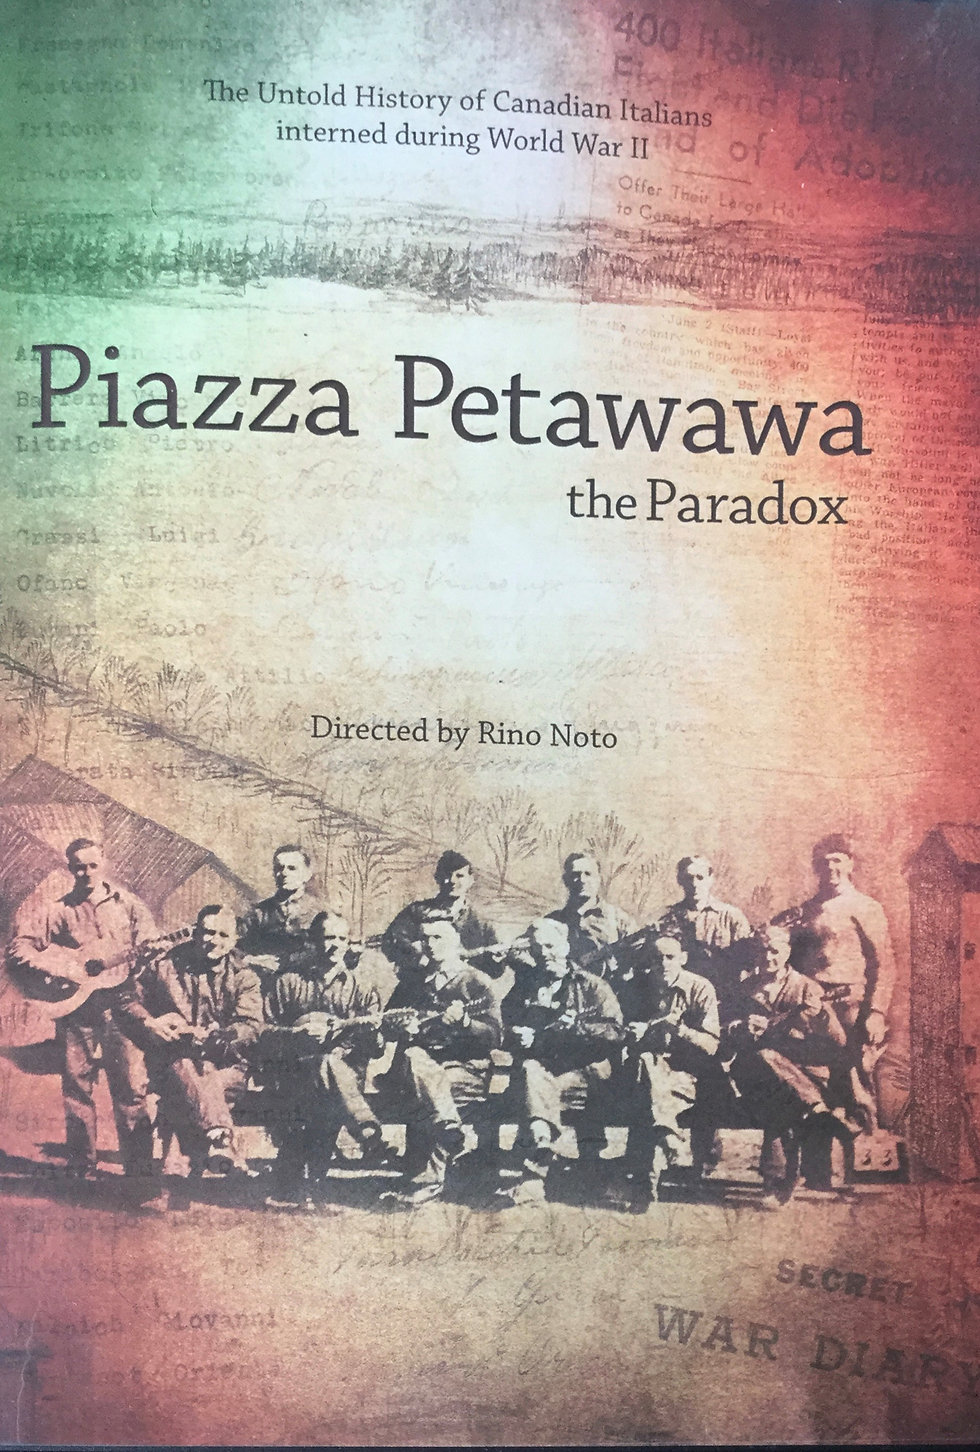 Piazza Petawawa-the Paradox.jpg